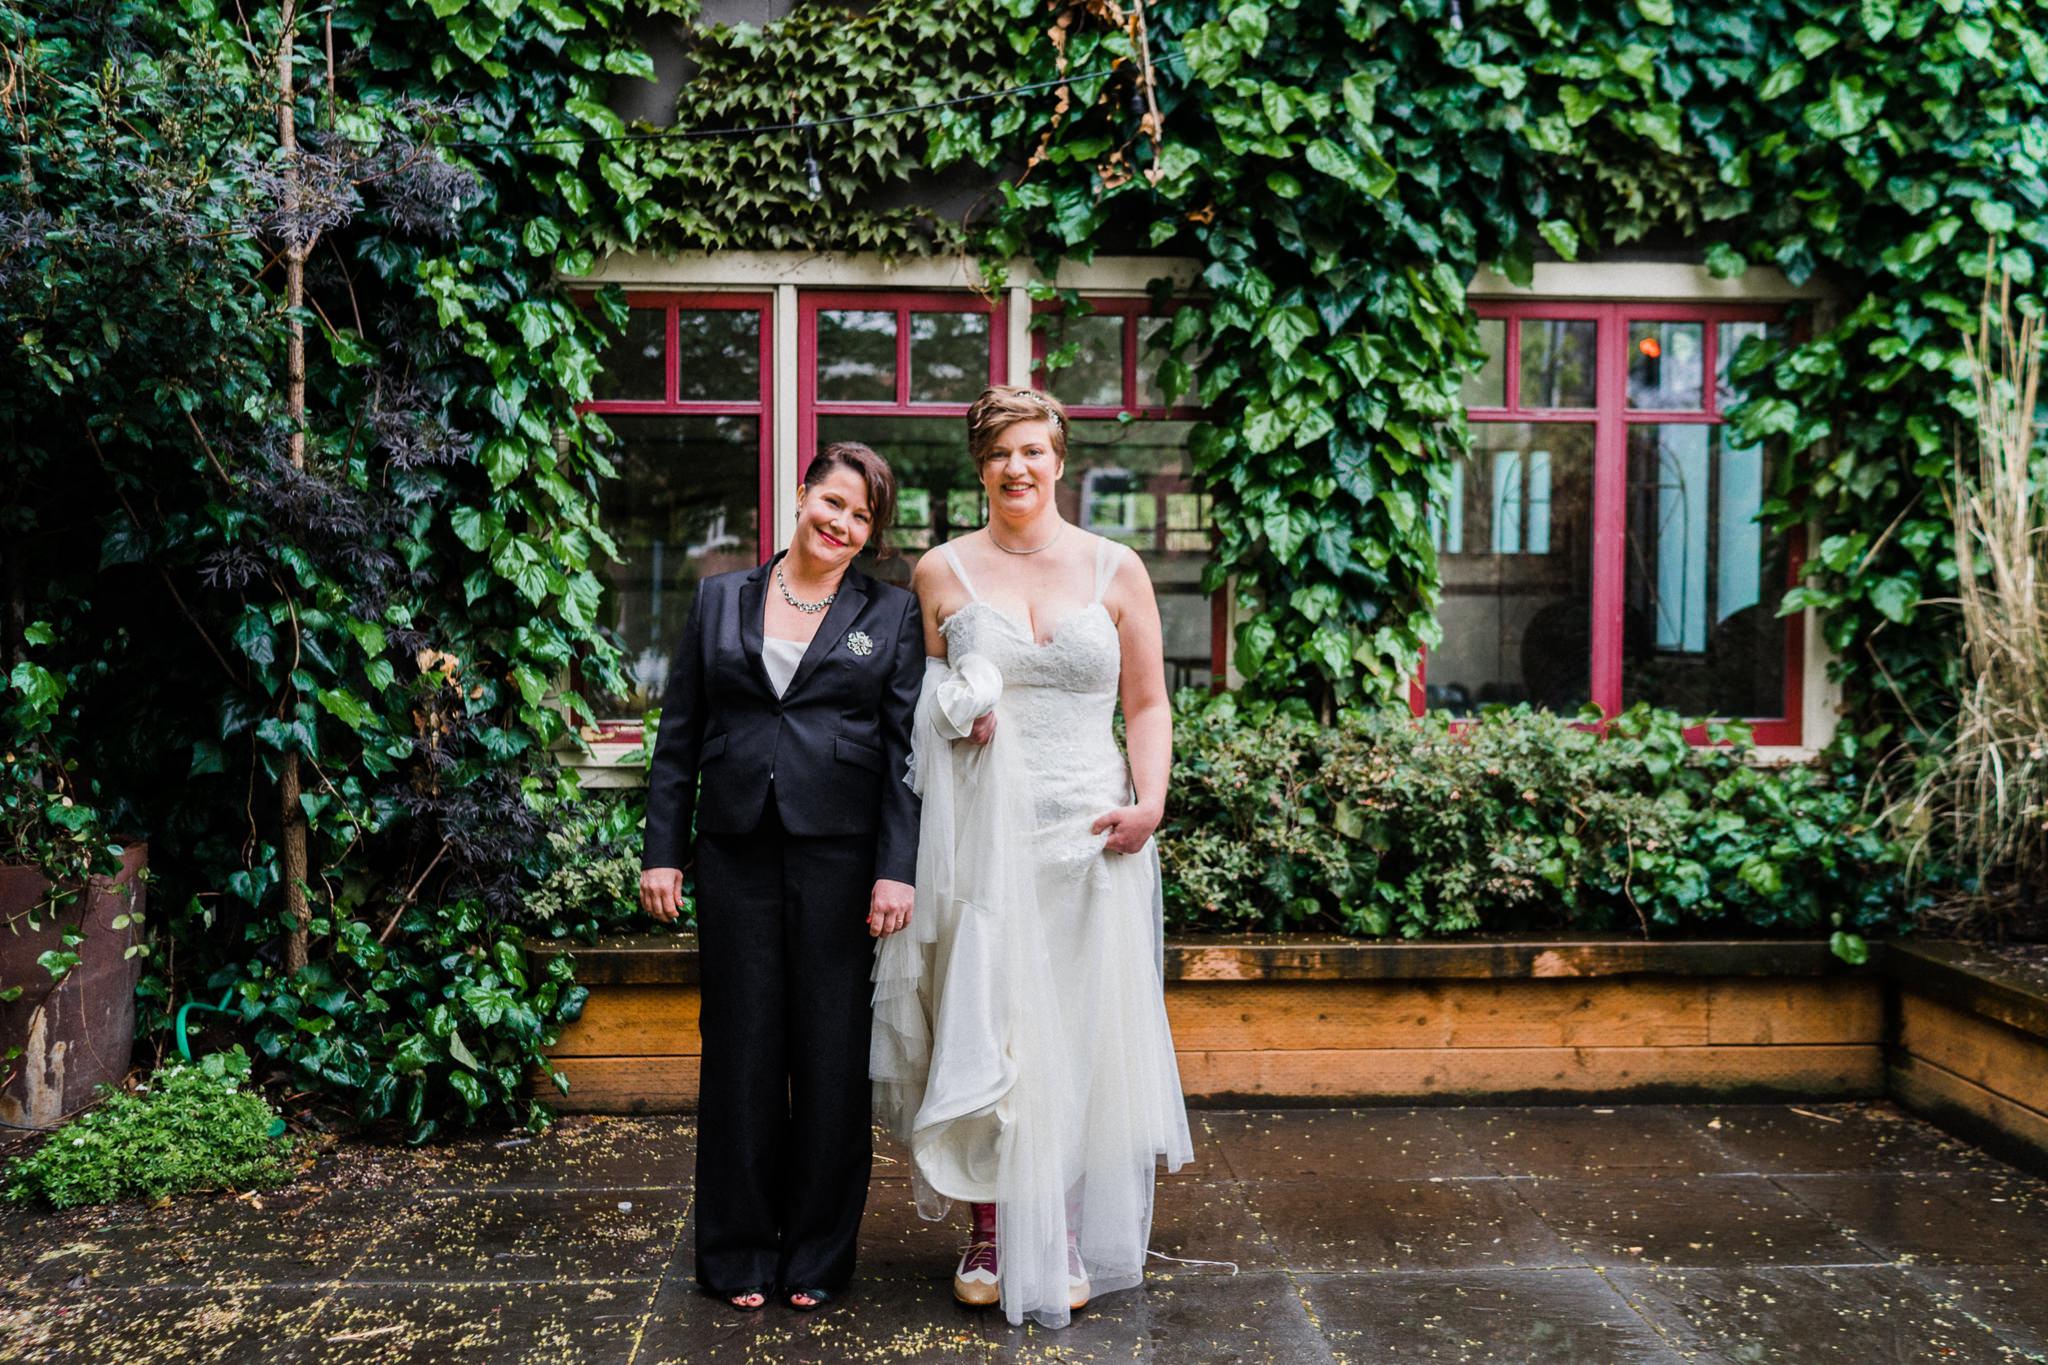 Green Ivy Frame Windows Brides